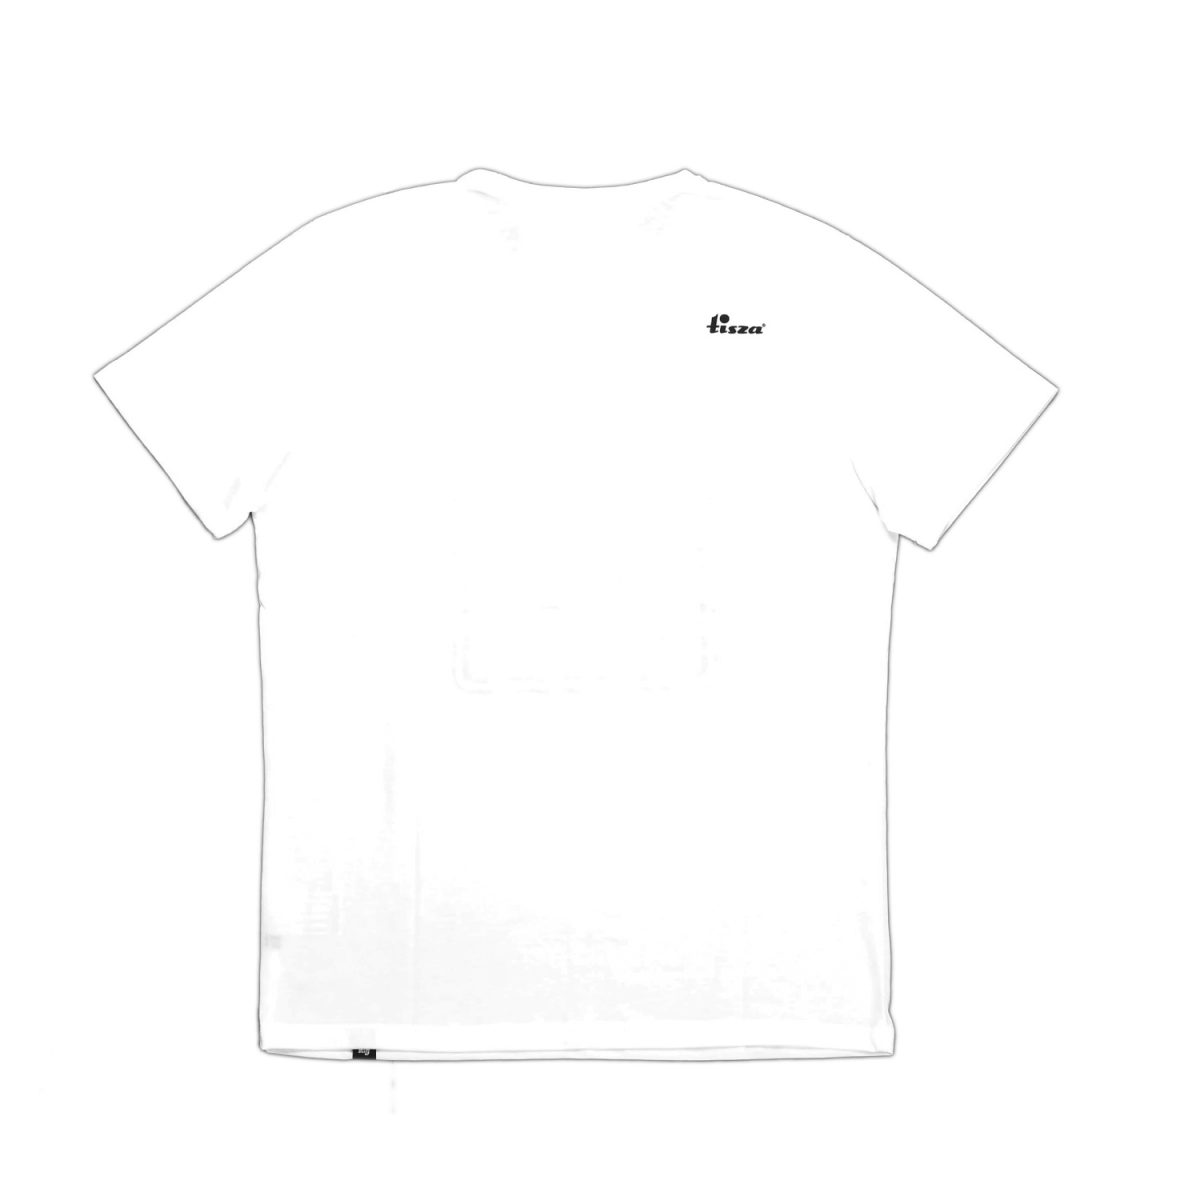 Tisza shoes - T-shirt - White T-logo